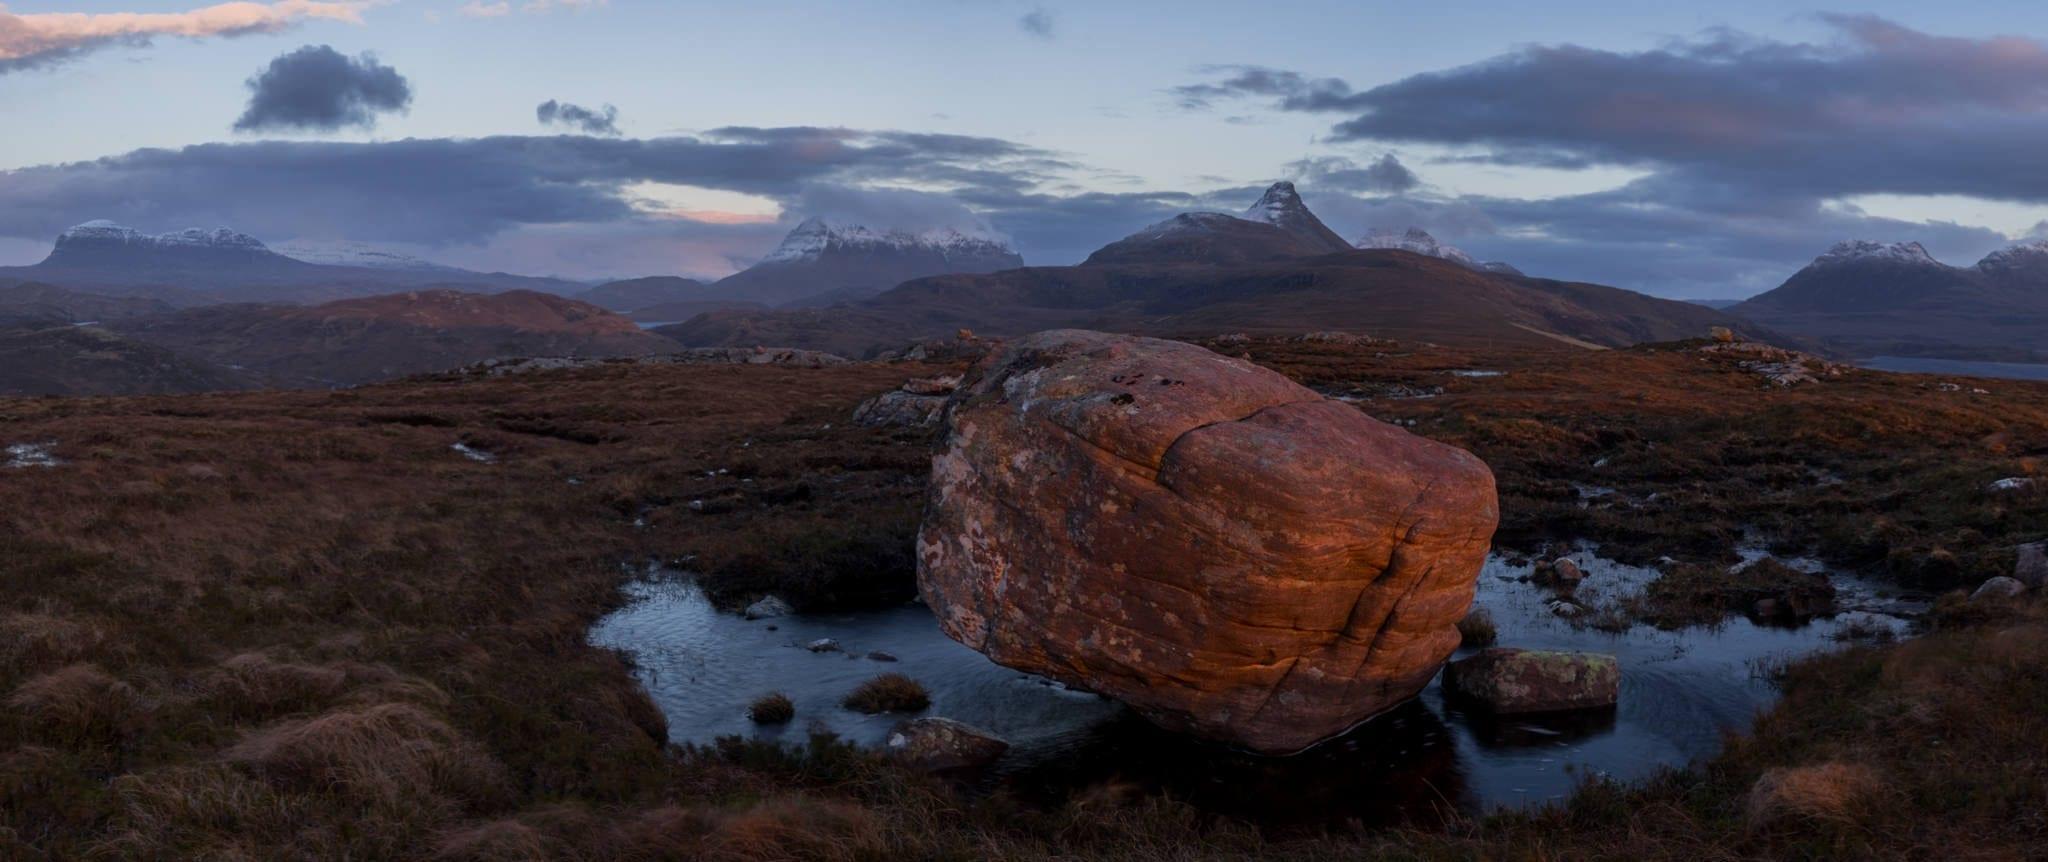 Torrodonian Sandstone - Scotland Wild Camping Photography Workshop